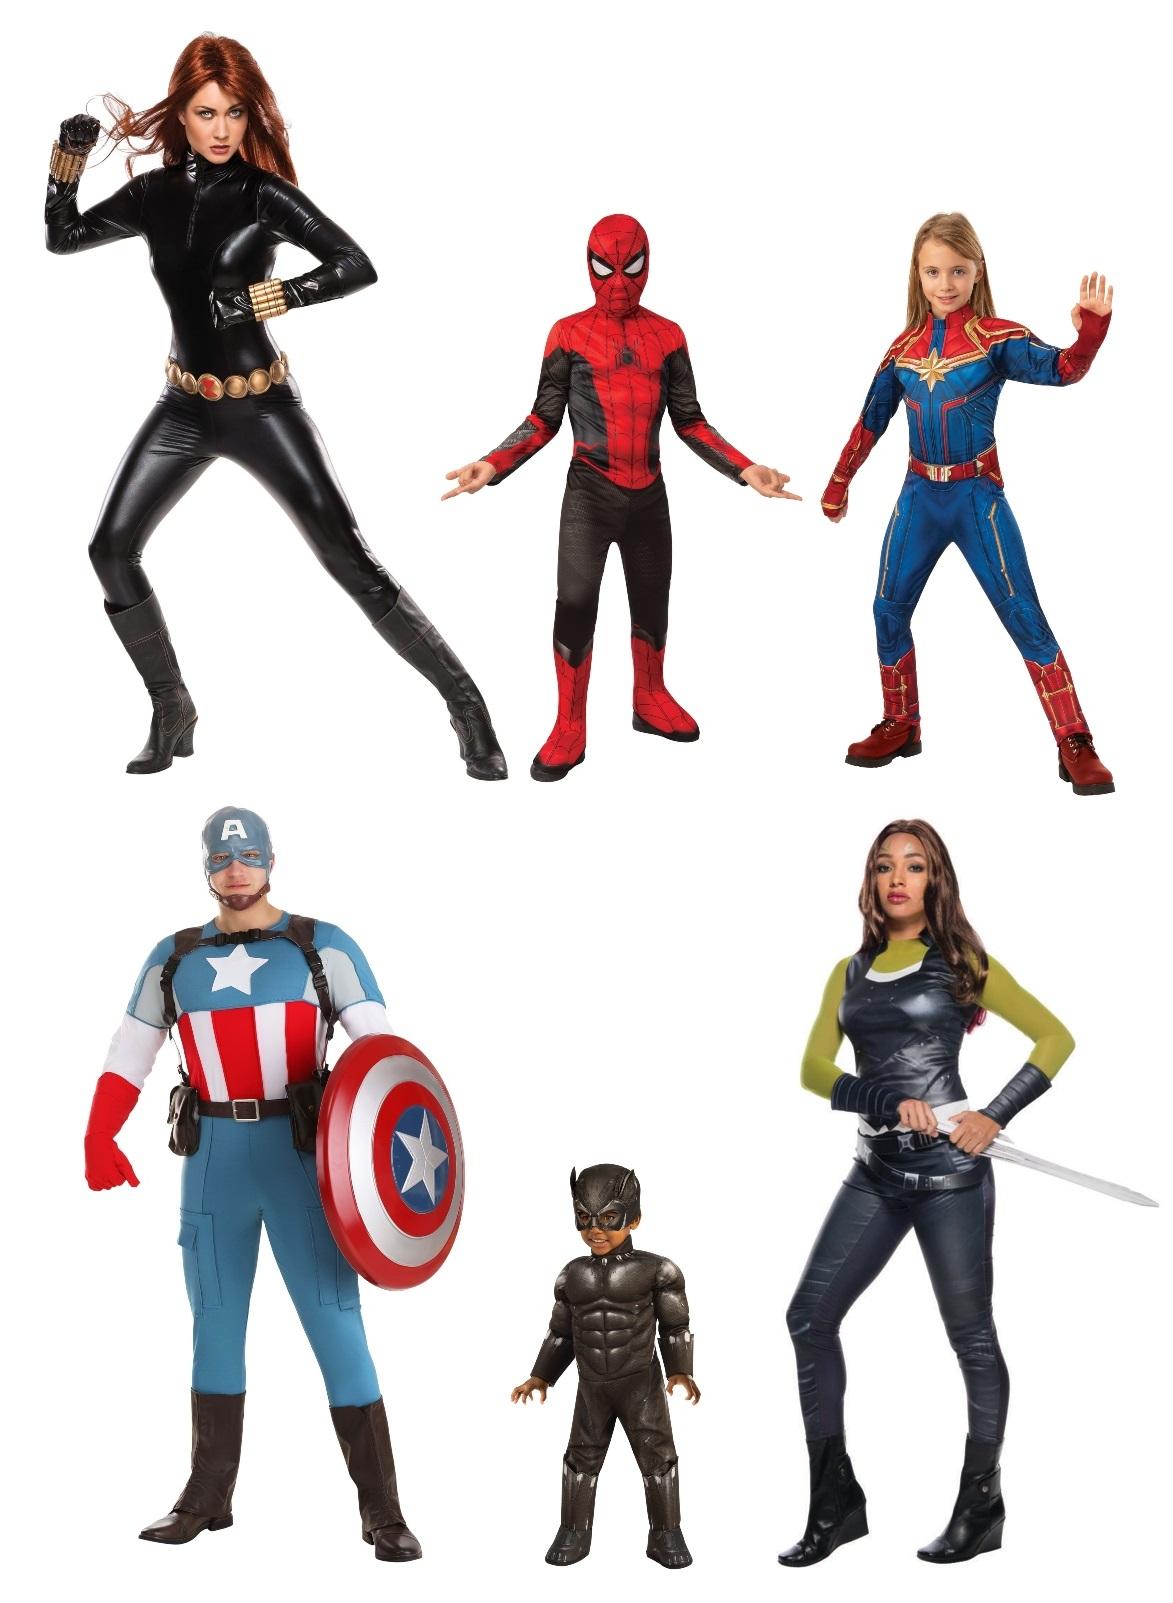 Avengers Group Costume Ideas